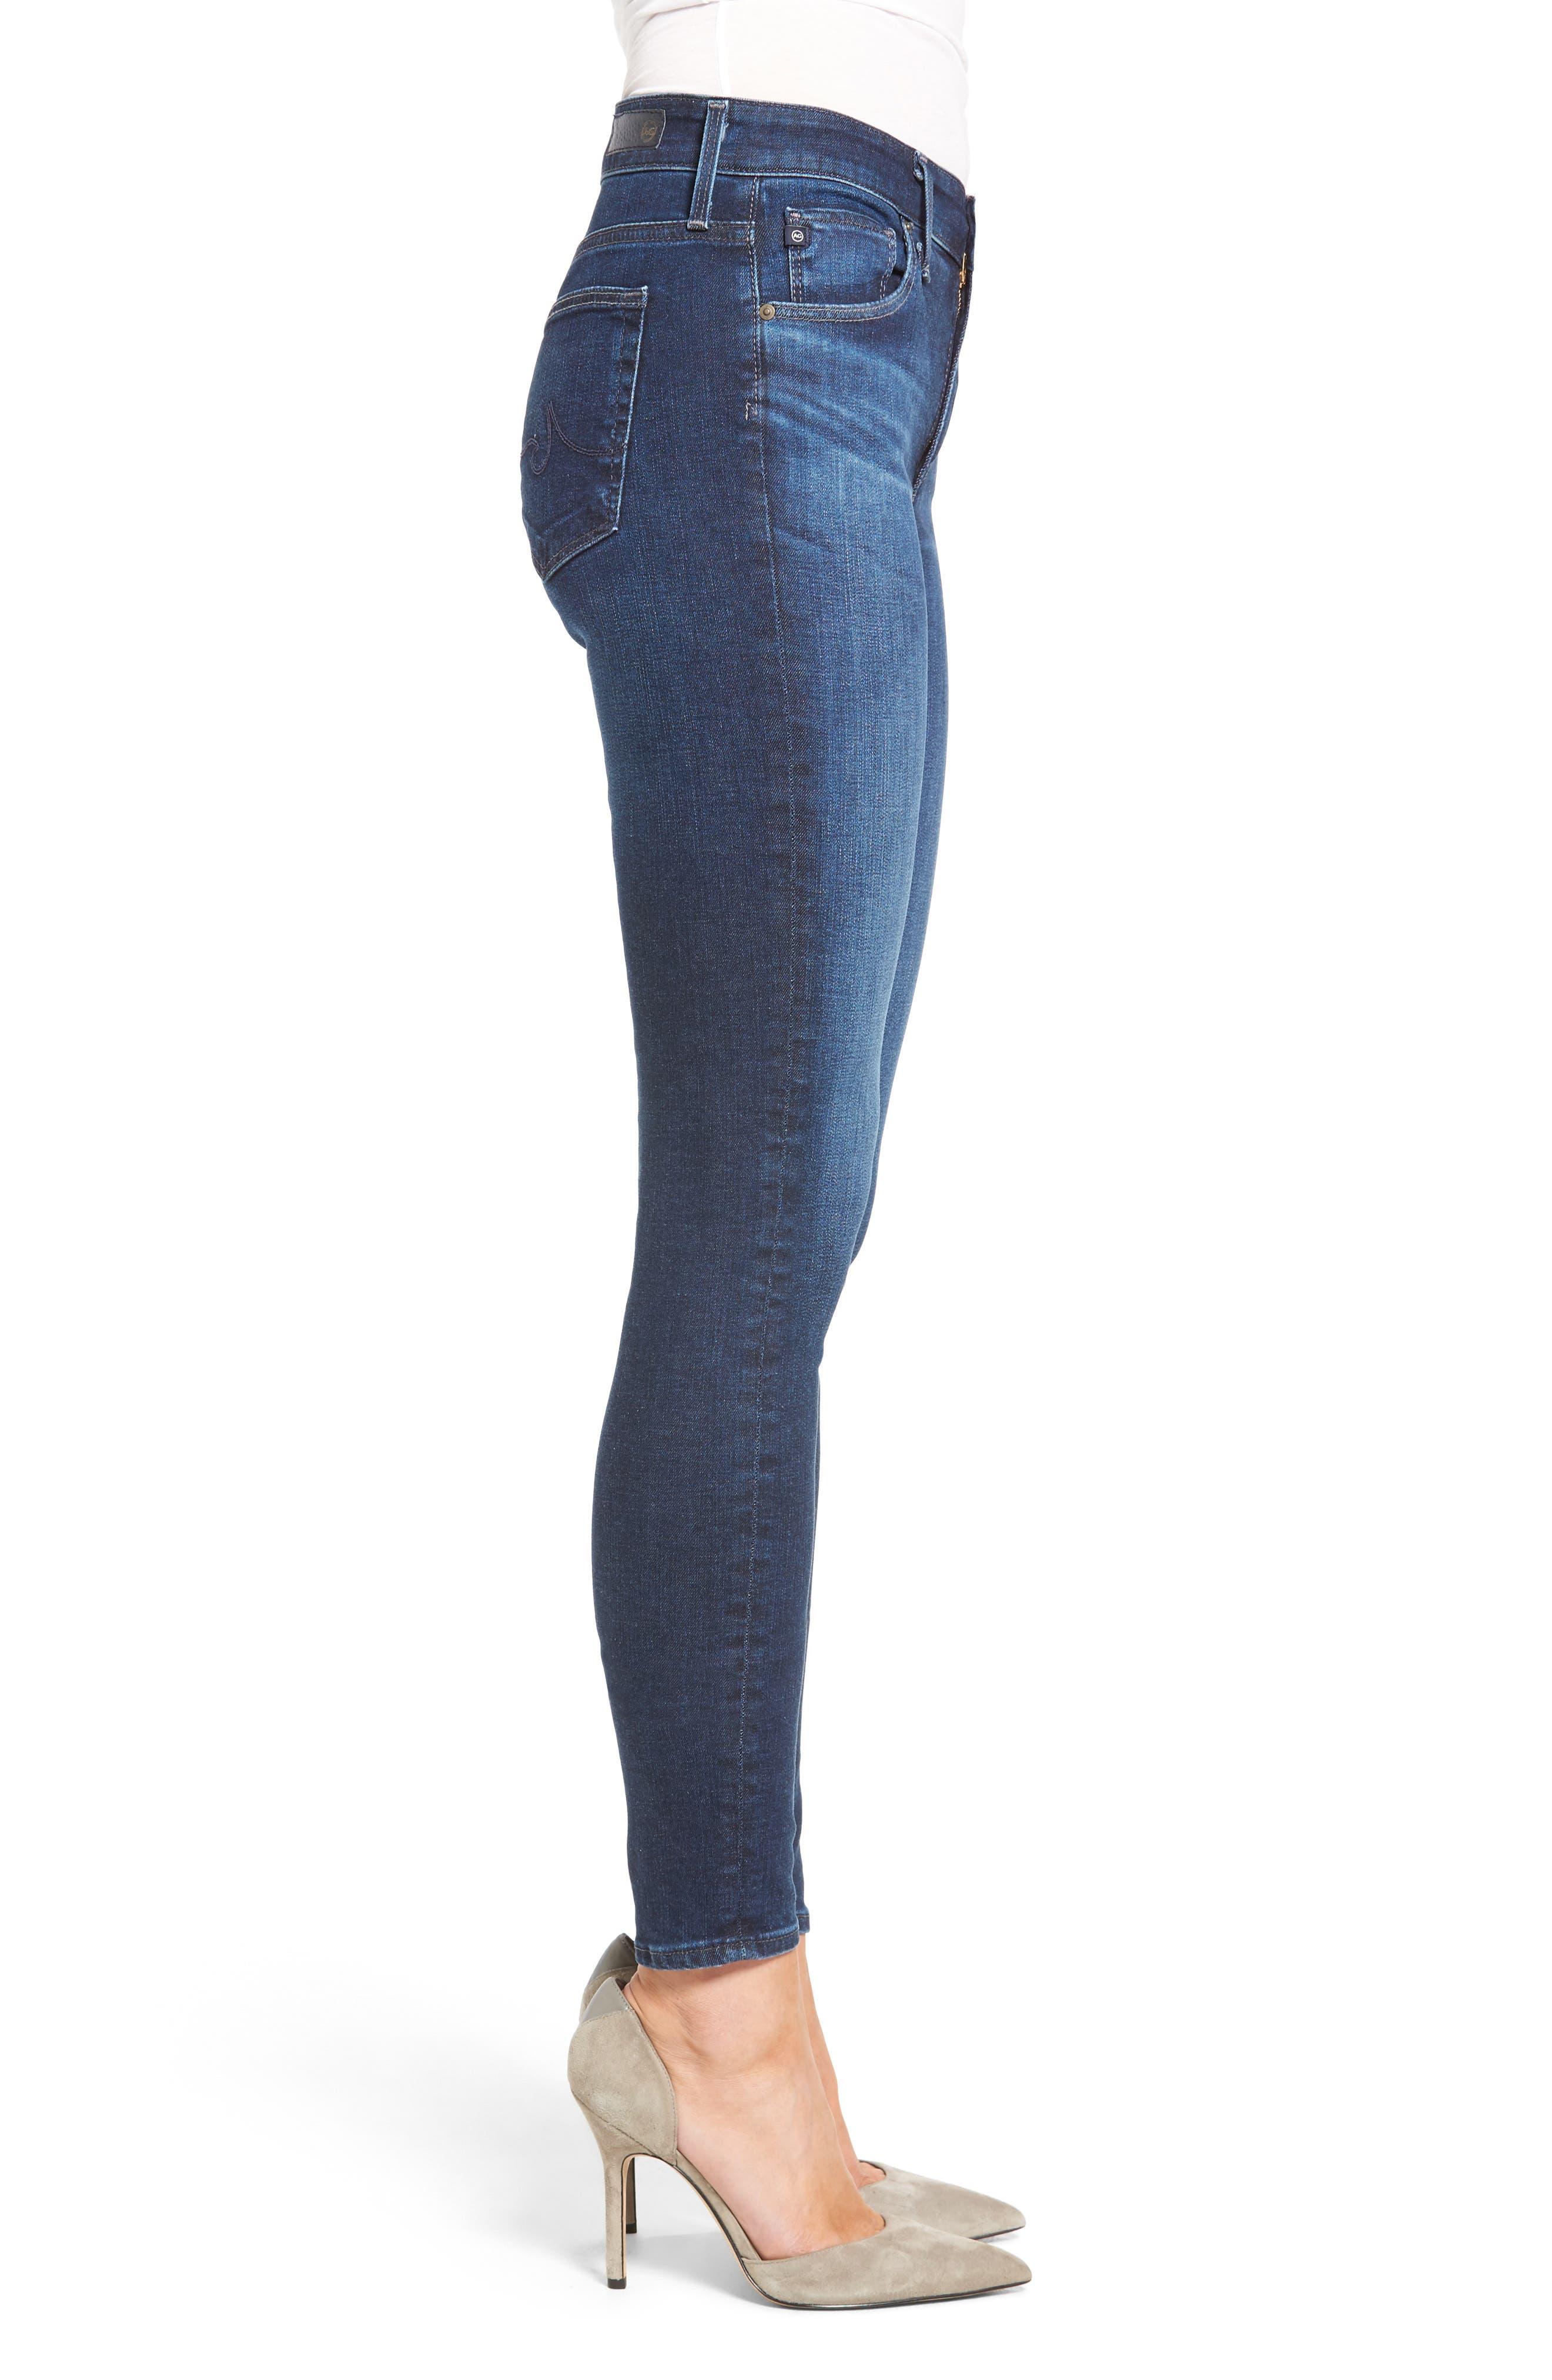 'The Farrah' High Rise Skinny Jeans,                             Alternate thumbnail 29, color,